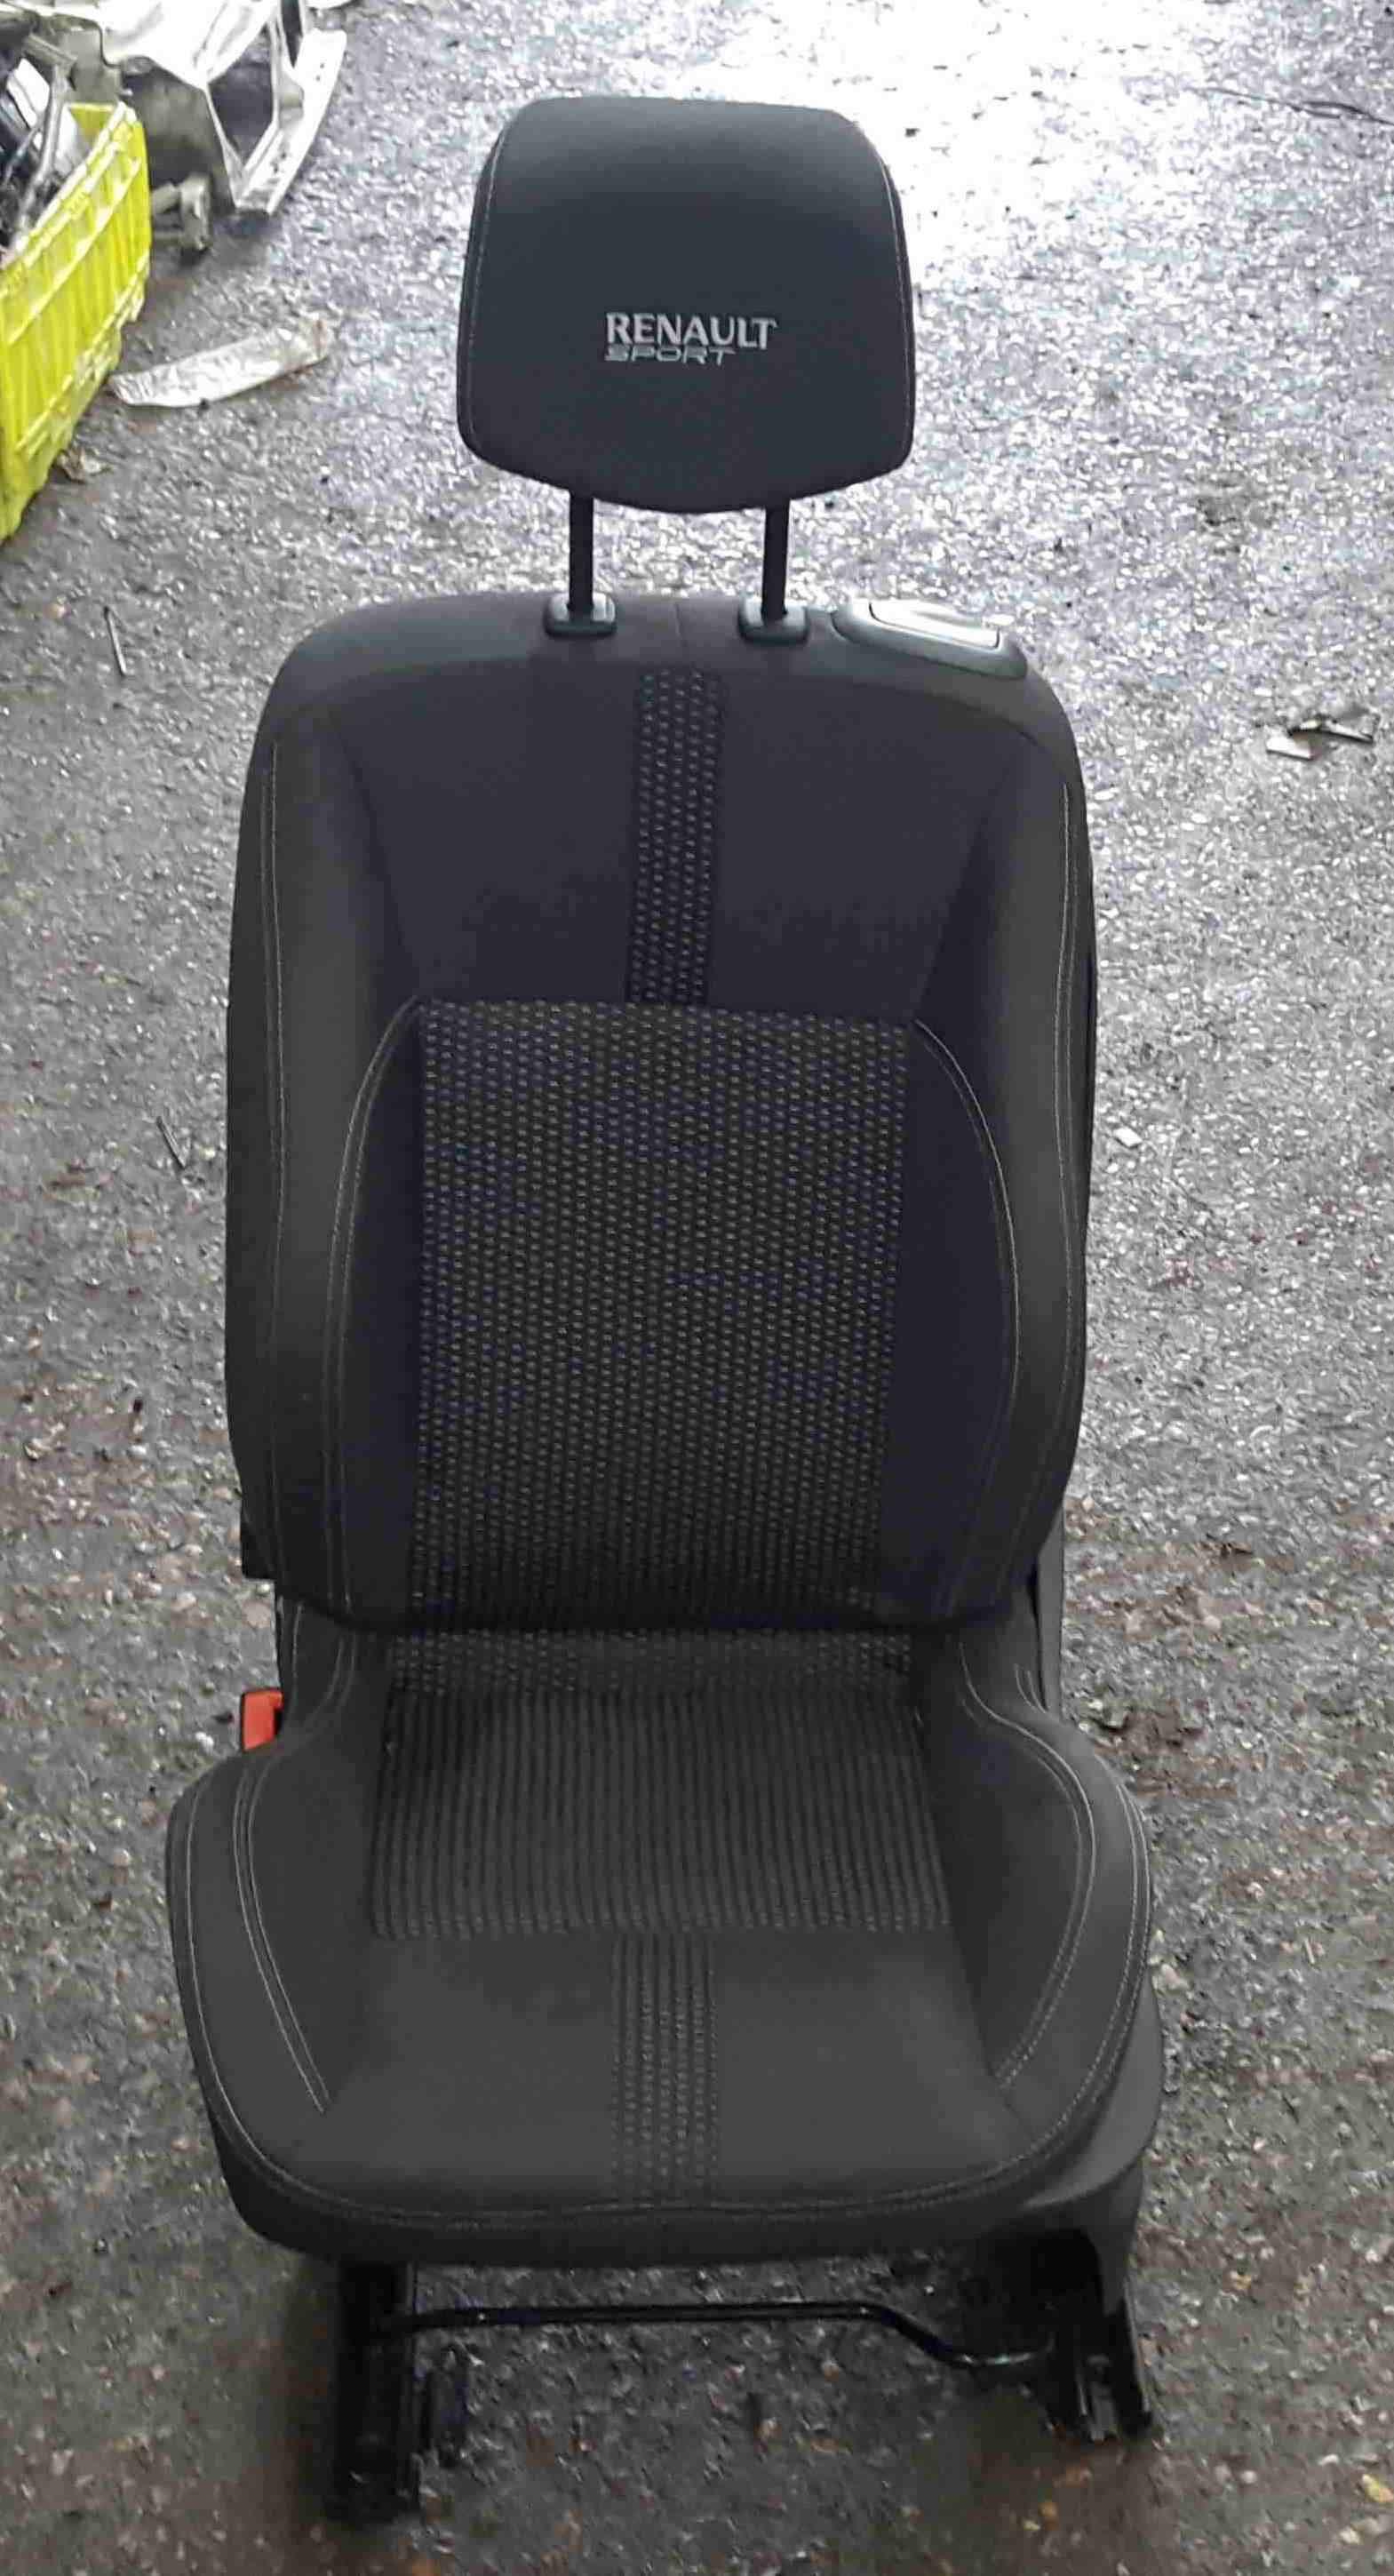 Renault Clio Sport MK3 2005-2012 197 200 Passenger NSF Front Seat Chair